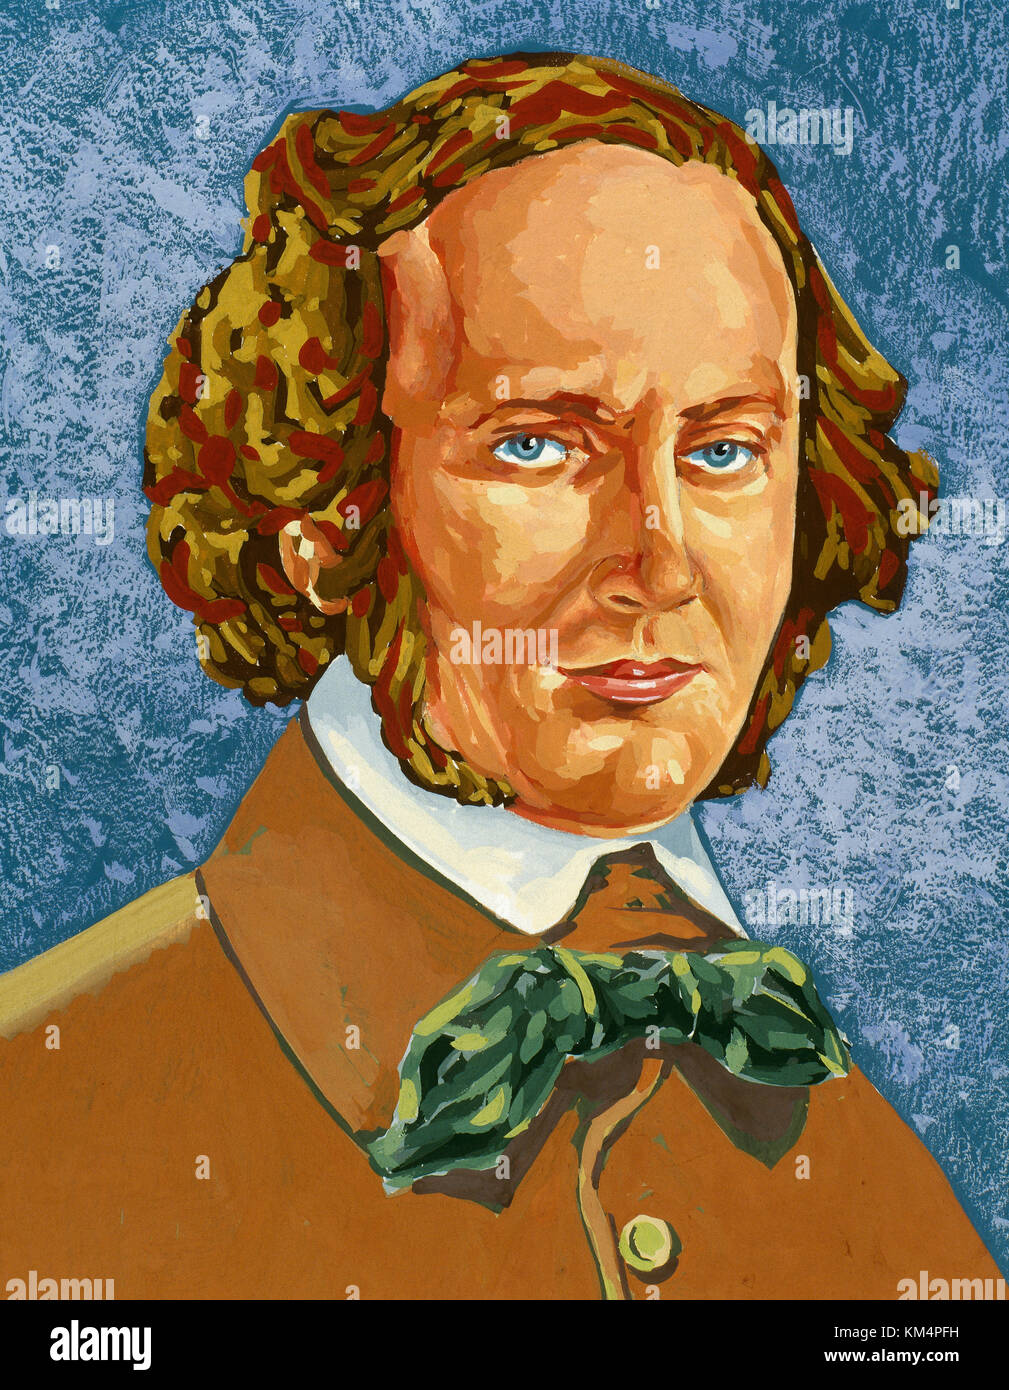 Felix Mendelssohn (1809-1847). German composer and pianist, organist and conductor. Romantic Period. Portrait. Watercolor. - Stock Image